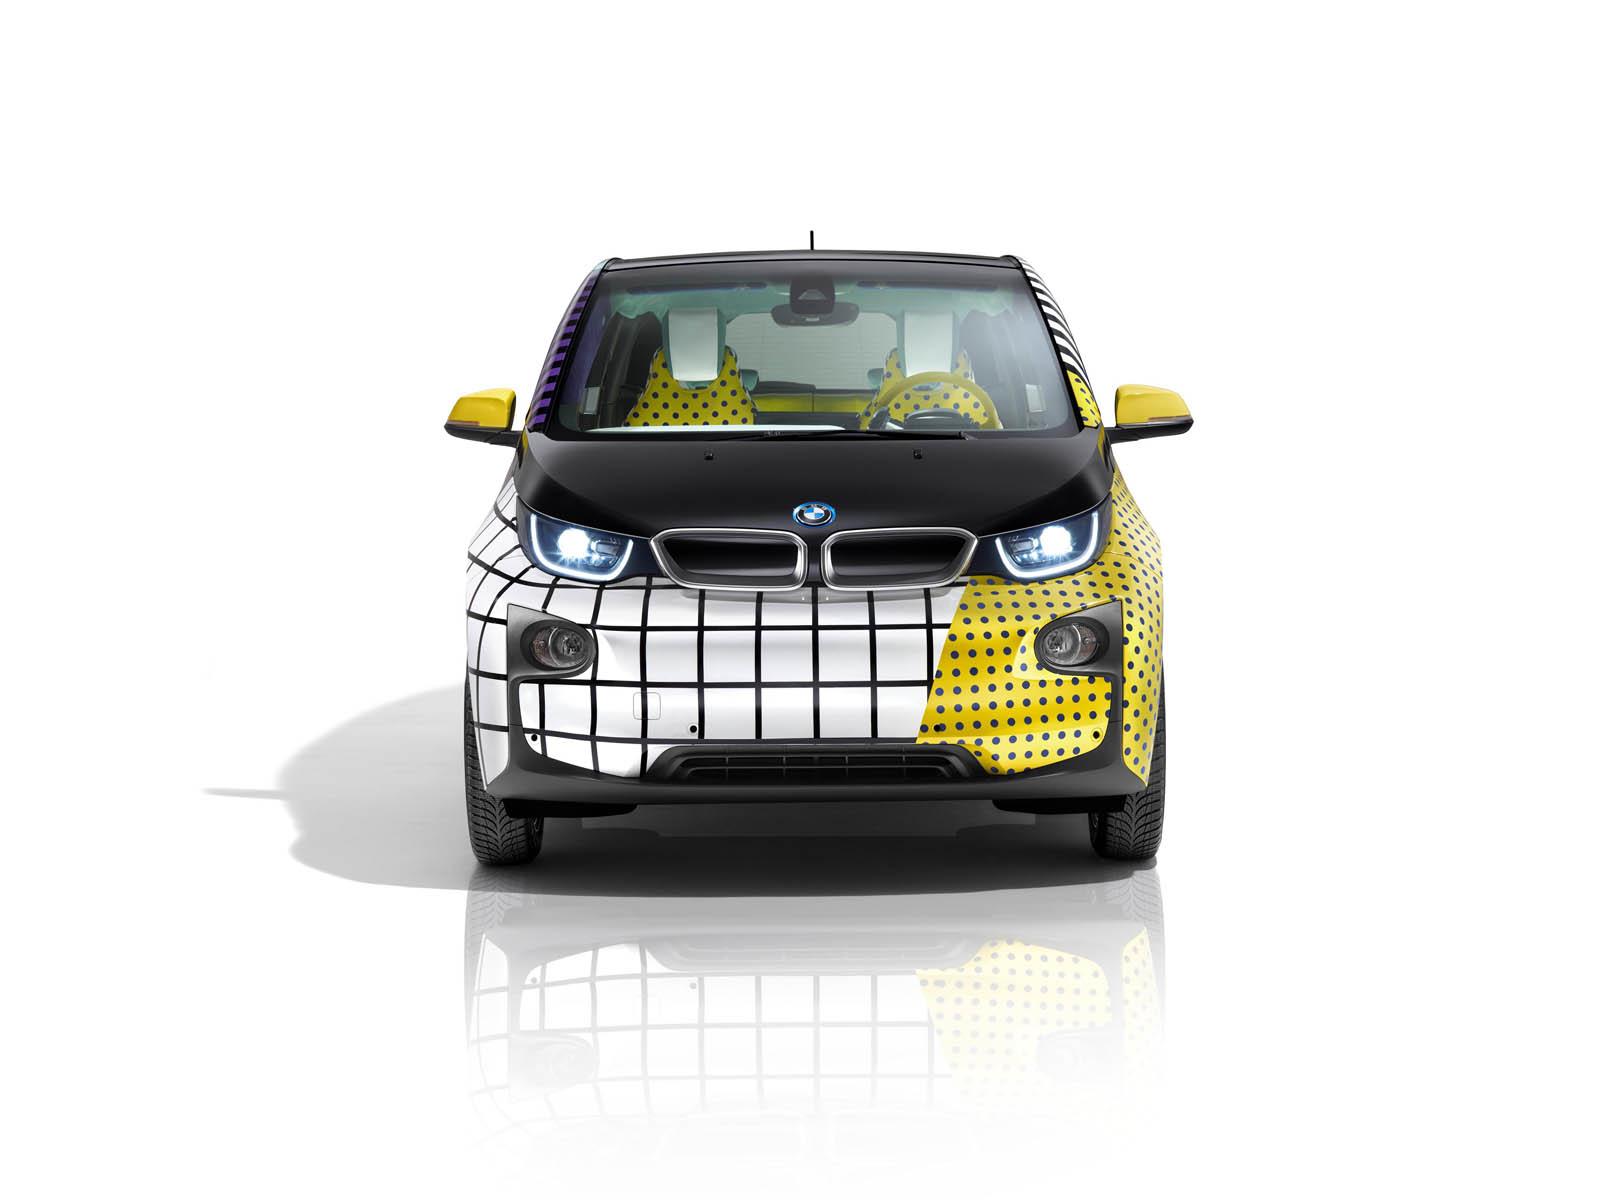 BMW i3 and i8 by Garage Italia Customs (9)